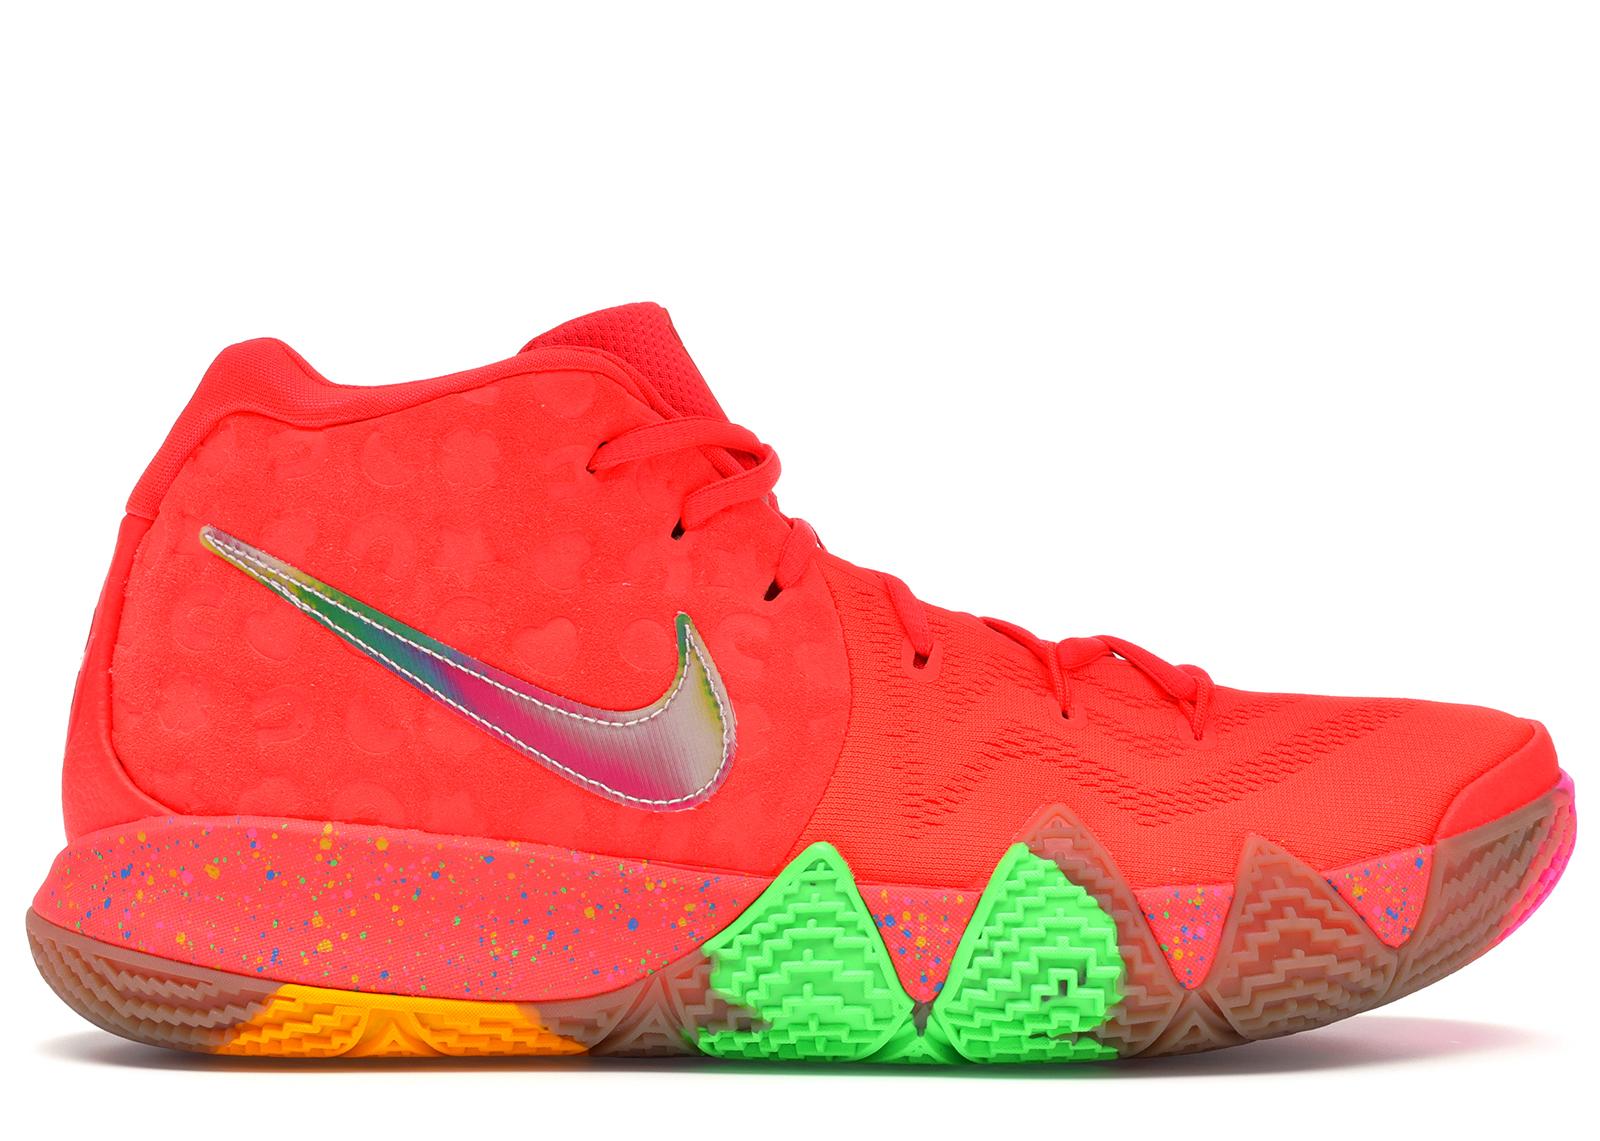 Nike Kyrie 4 Lucky Charms - BV0428-600